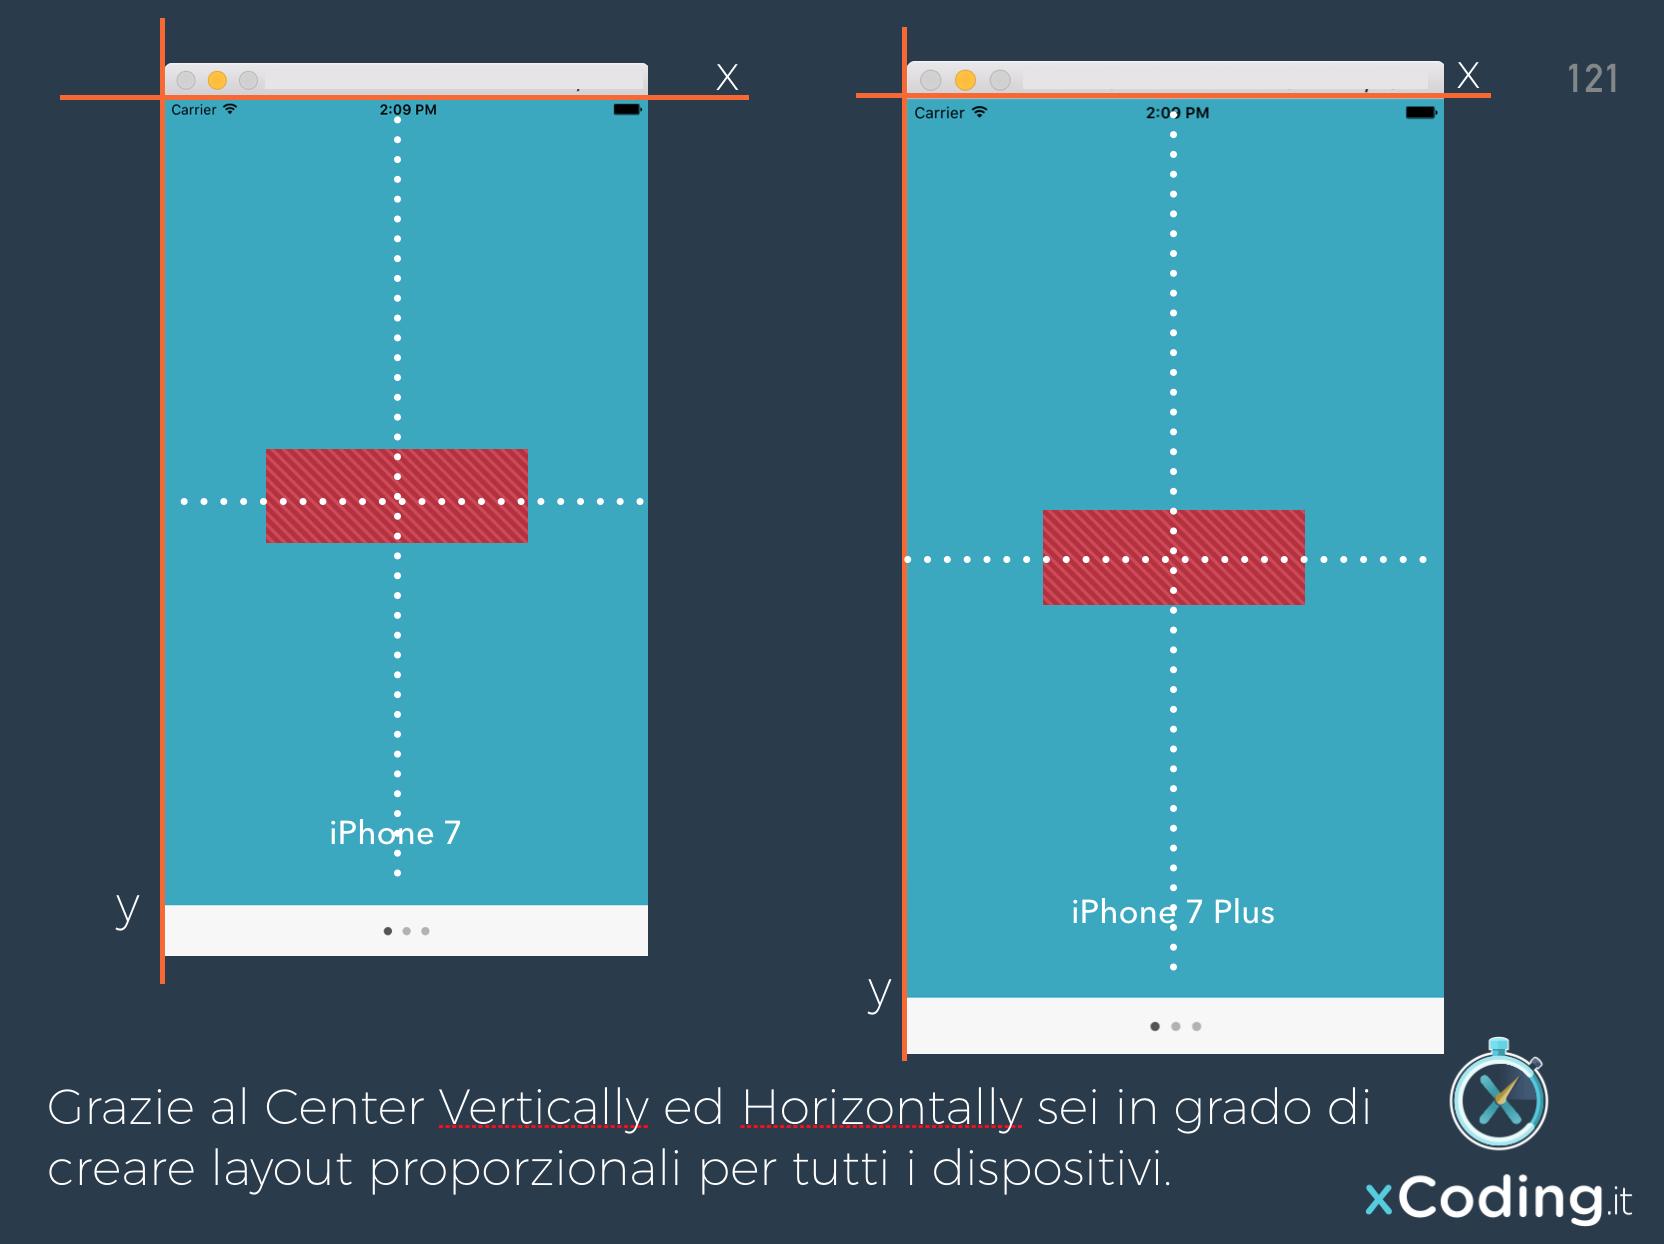 center-horizontally-e-vertically-auto-layout-xcode